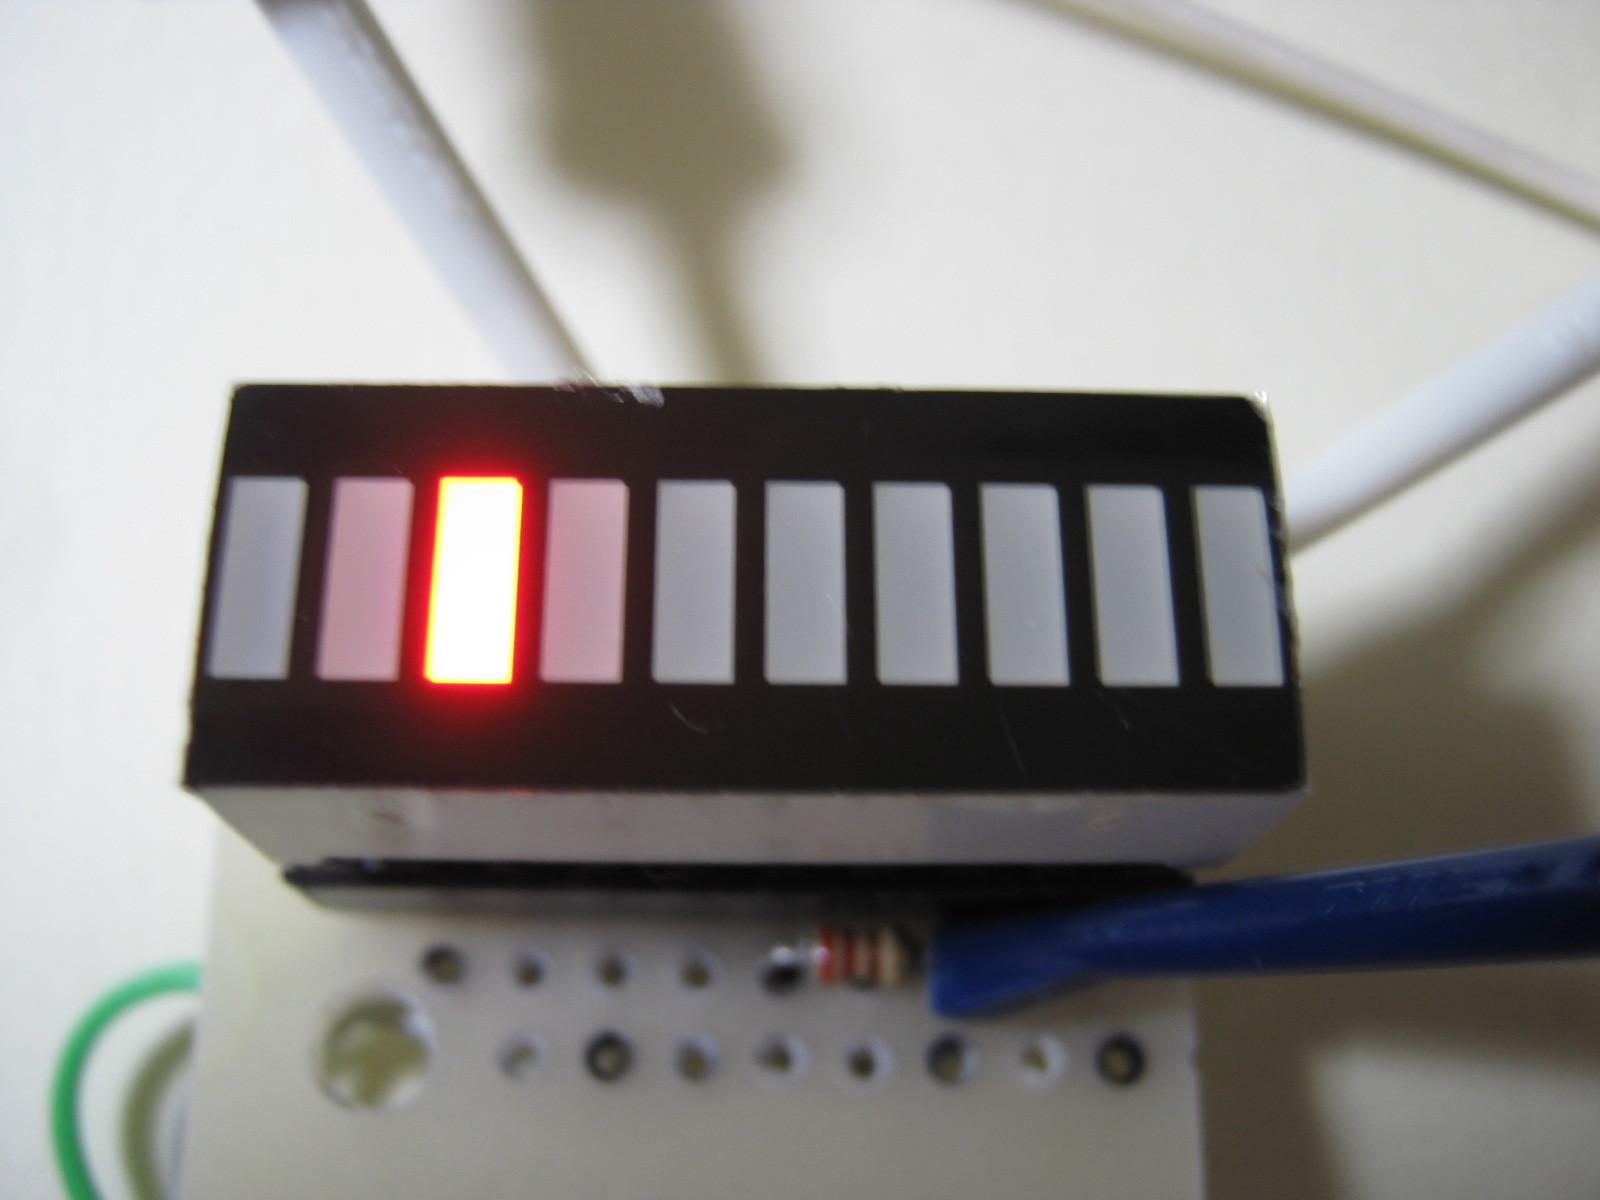 RFチェッカー表示部の製作(ATtiny13A版)表示例27MHz無変調時